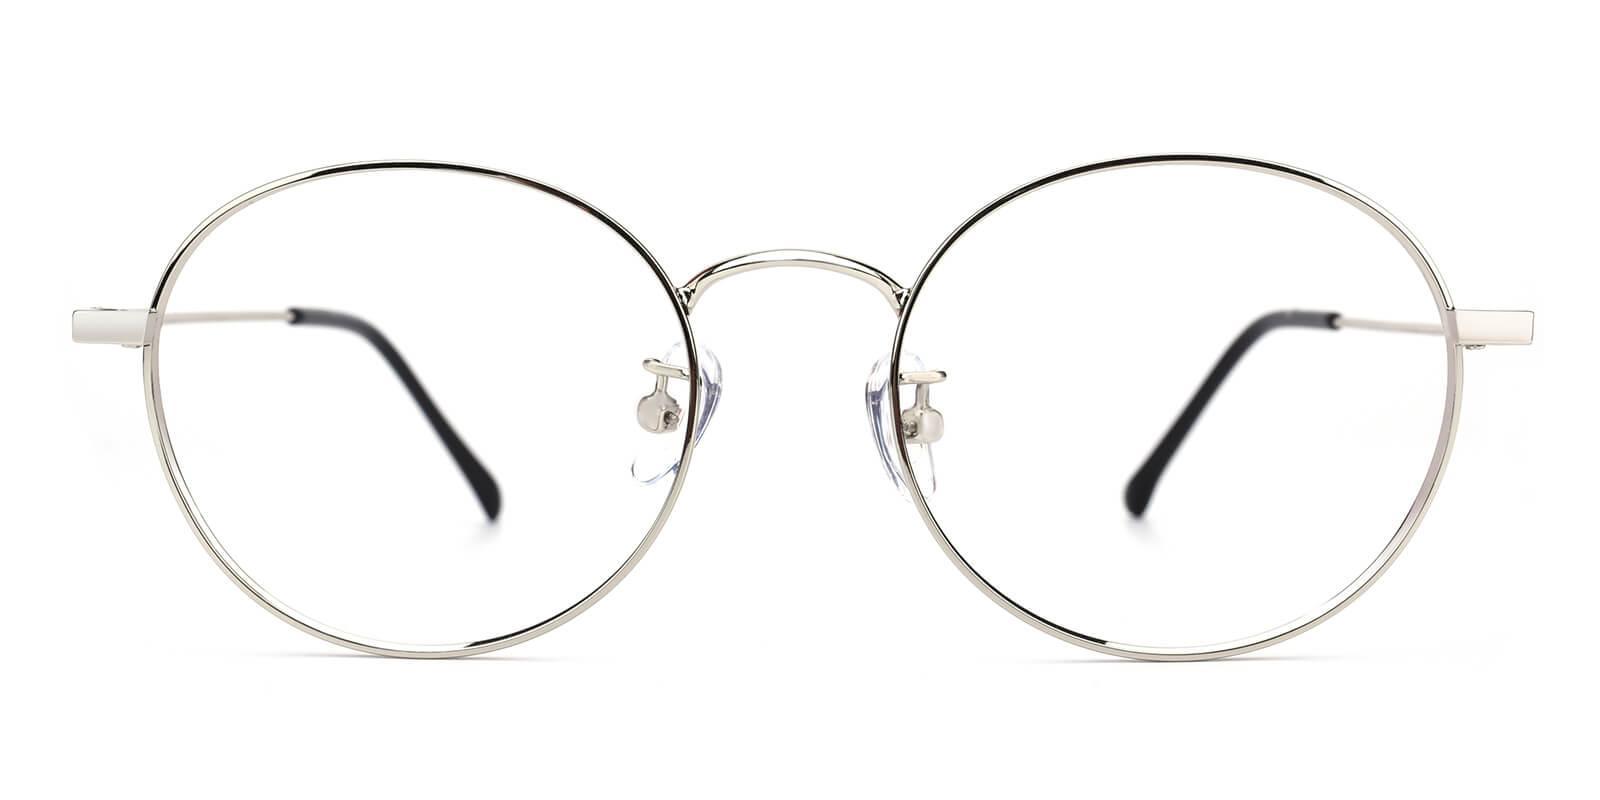 Hibbardr-Silver-Round-Metal-Eyeglasses-additional2